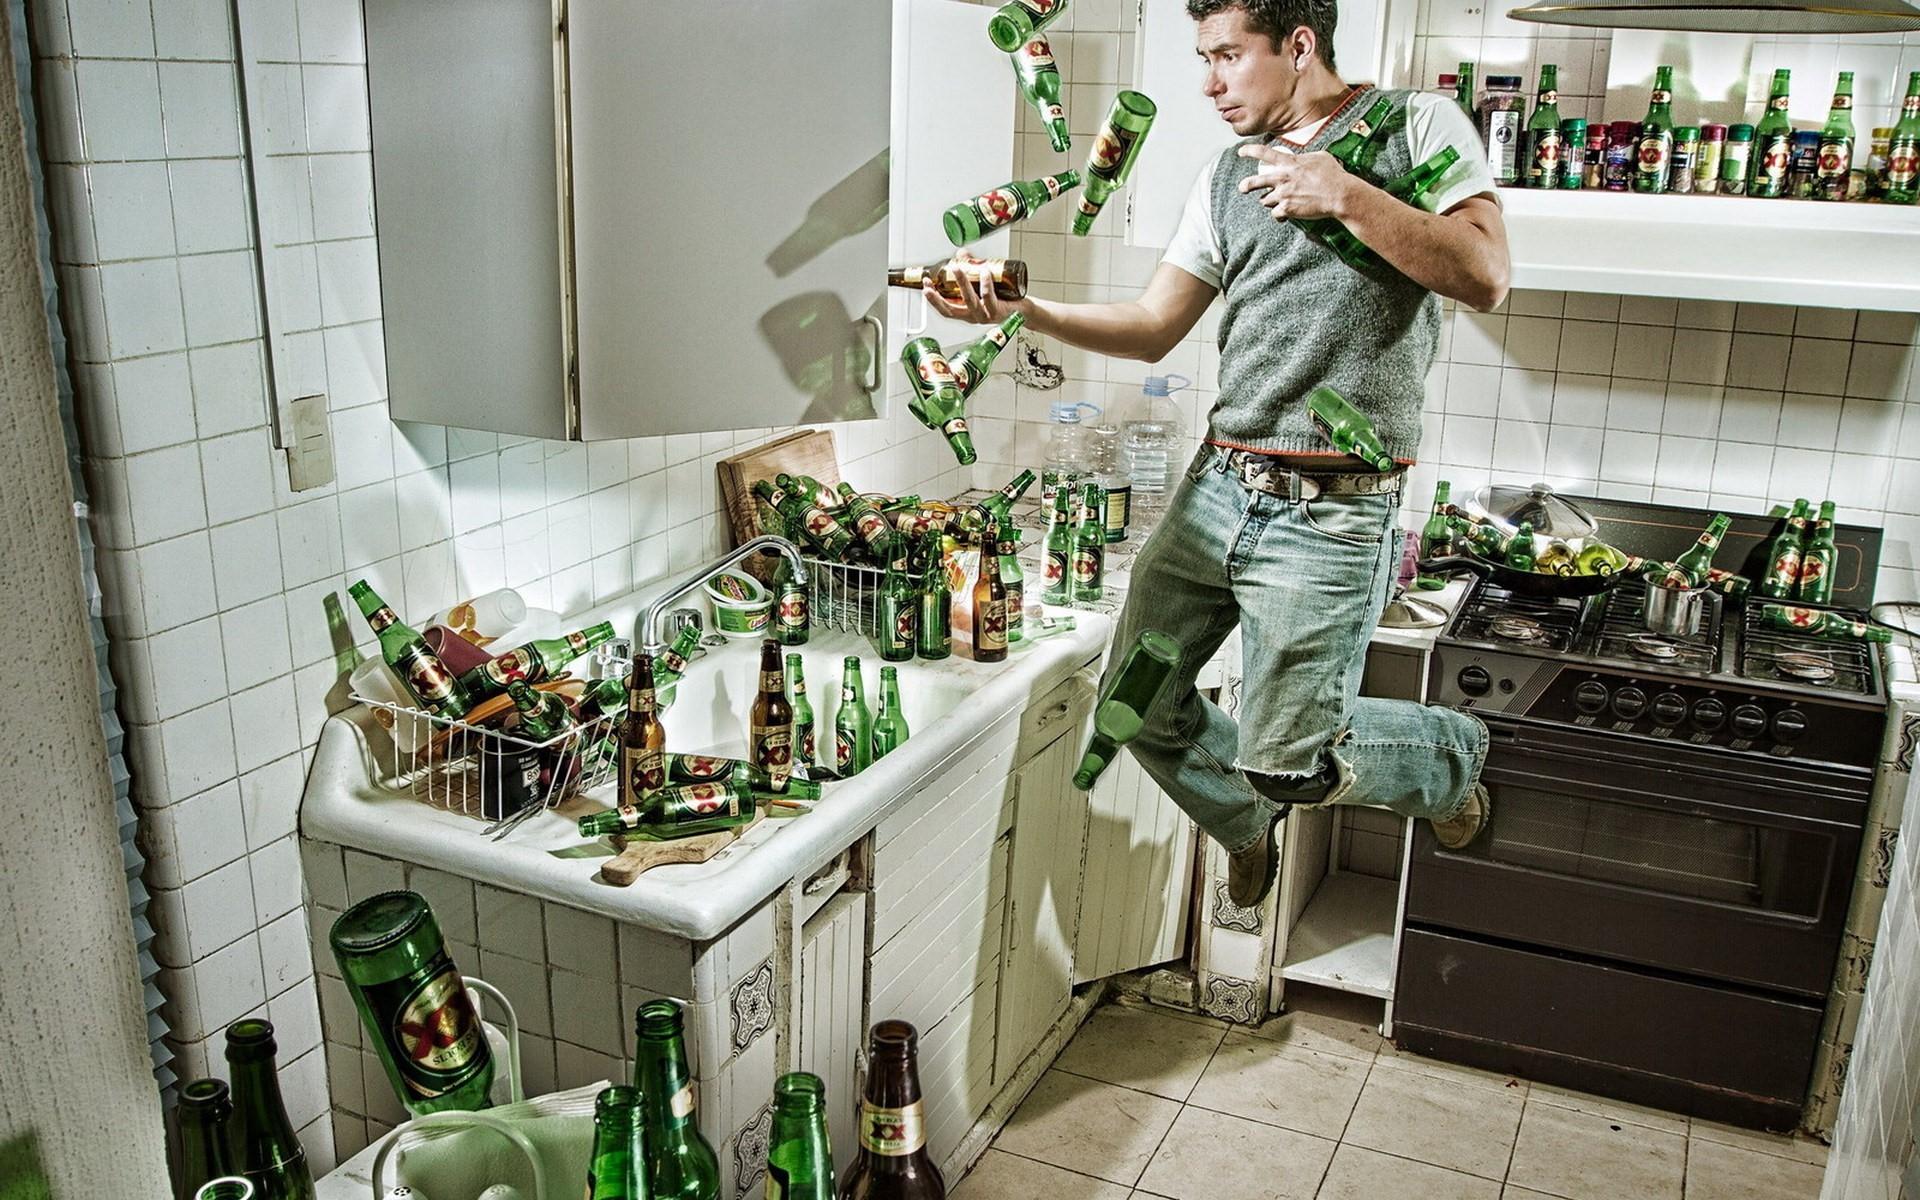 один вид мужчина на кухне приколы фото такая